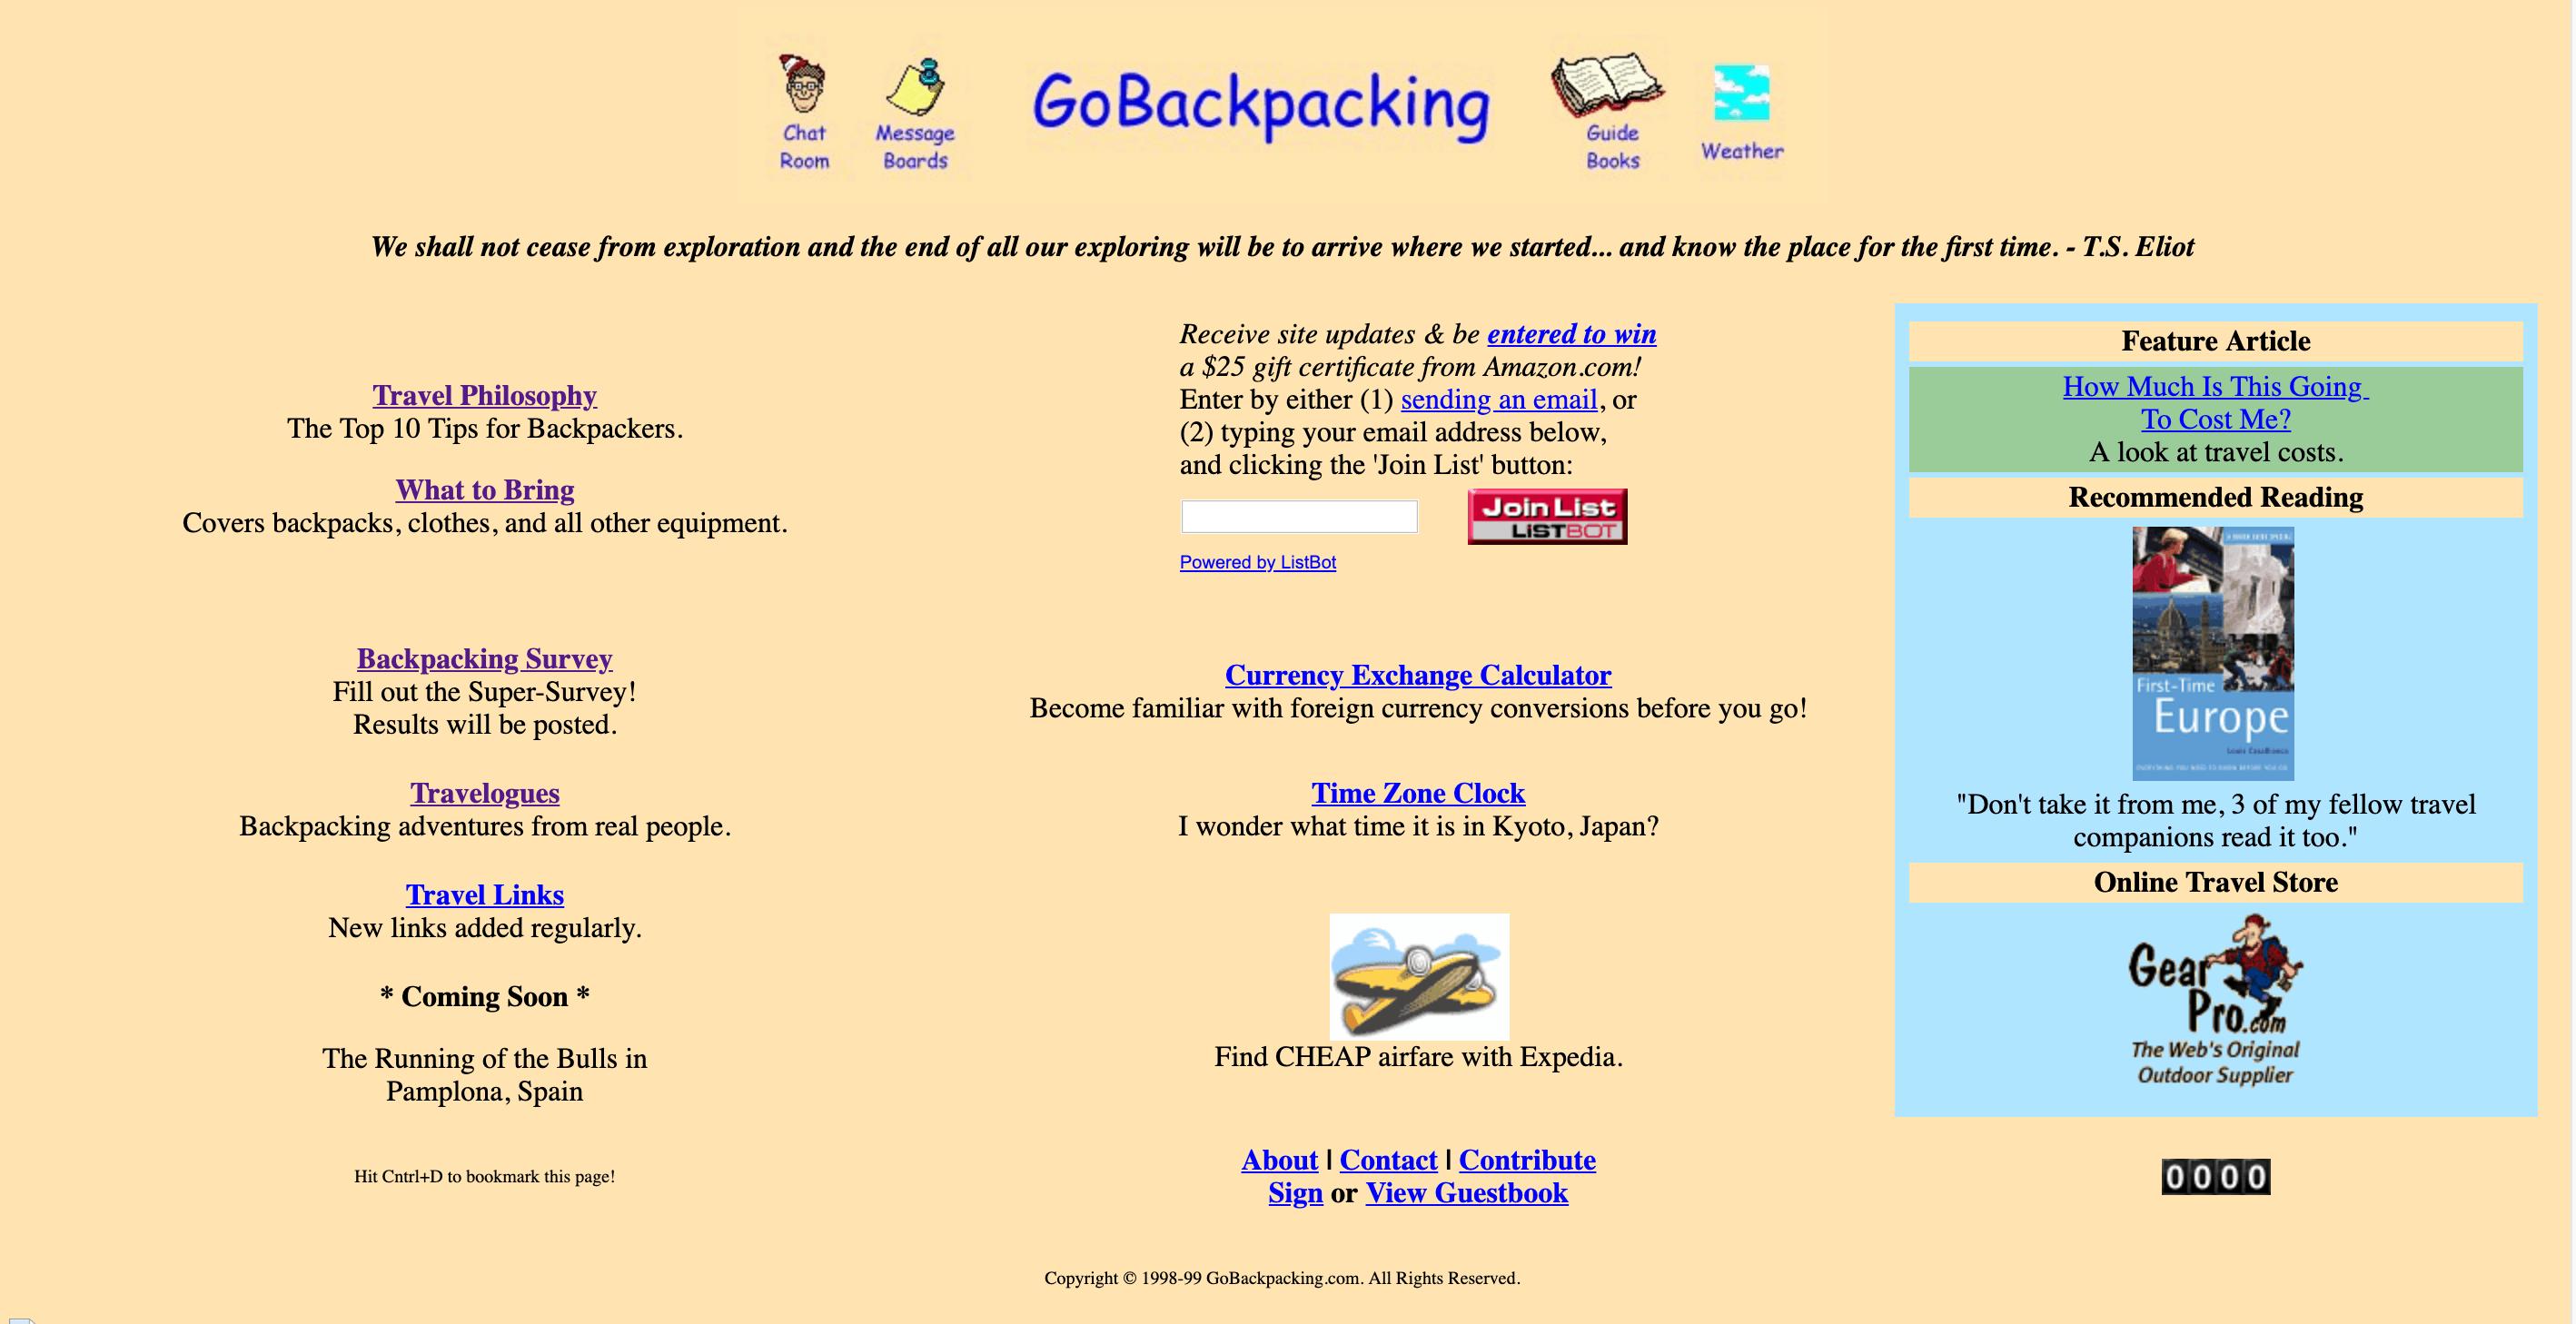 Go Backpacking (circa 1999)